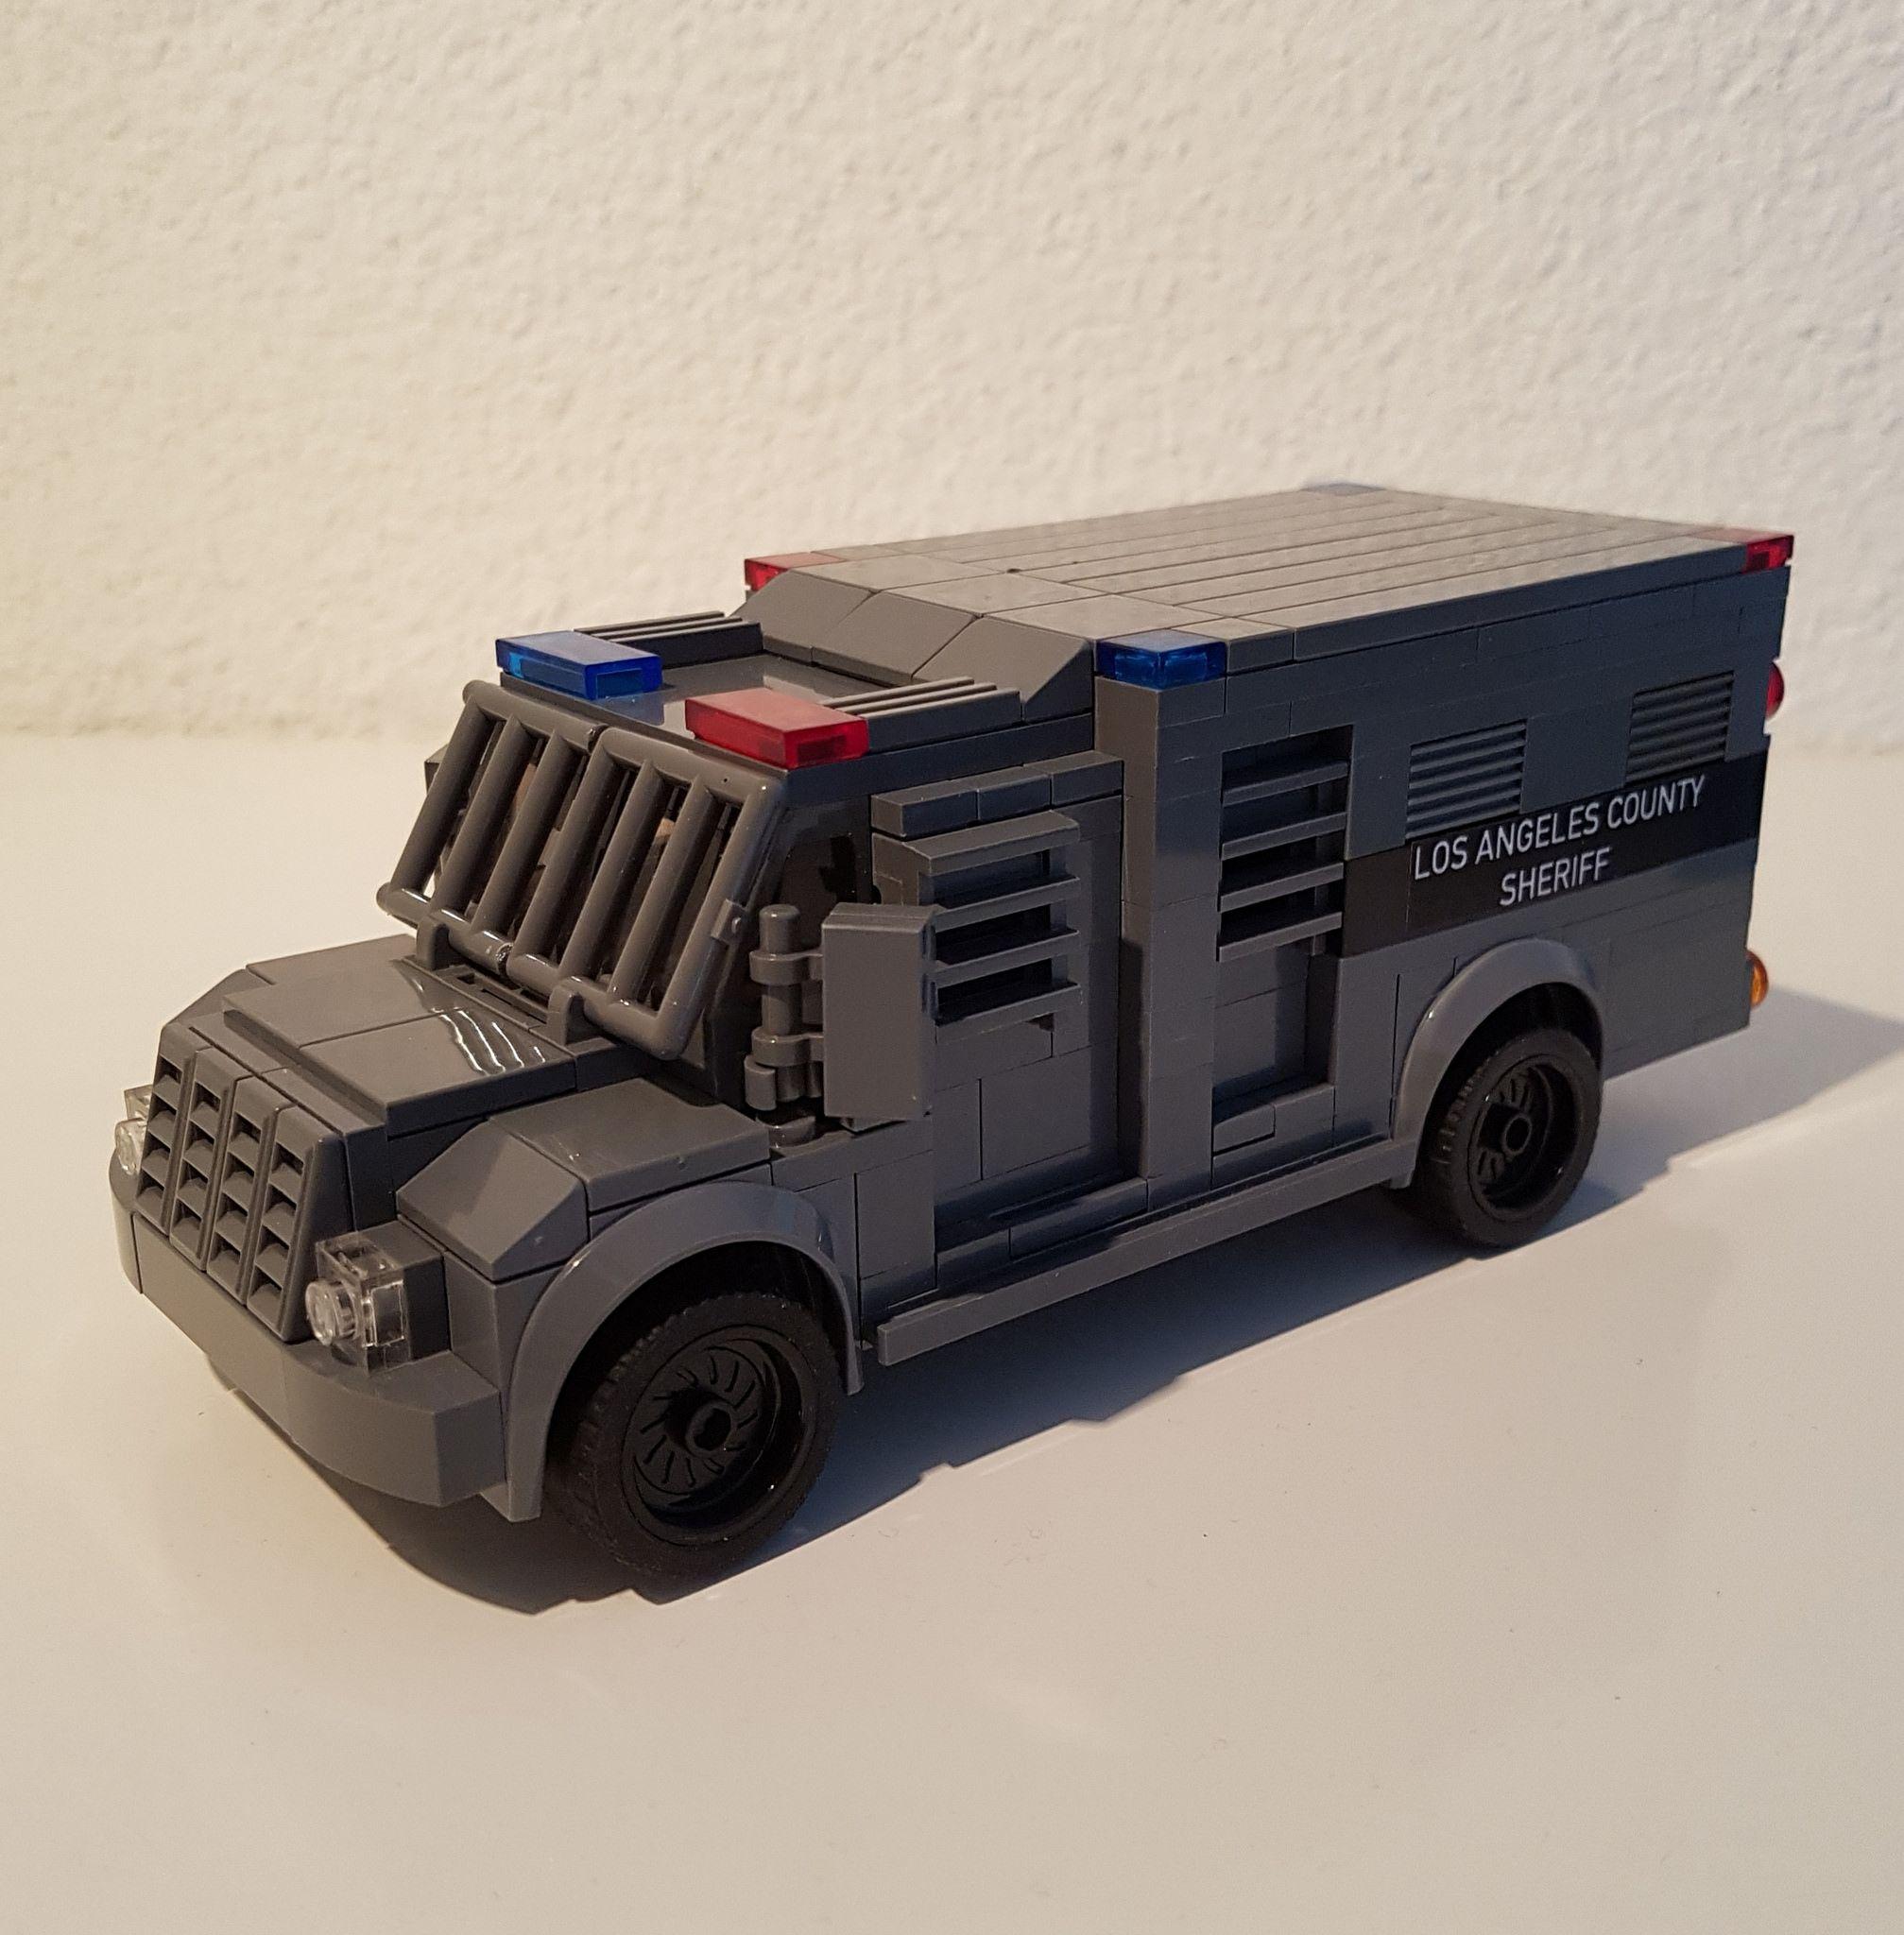 Swat Truck Lego Cars Lego Truck Lego Models